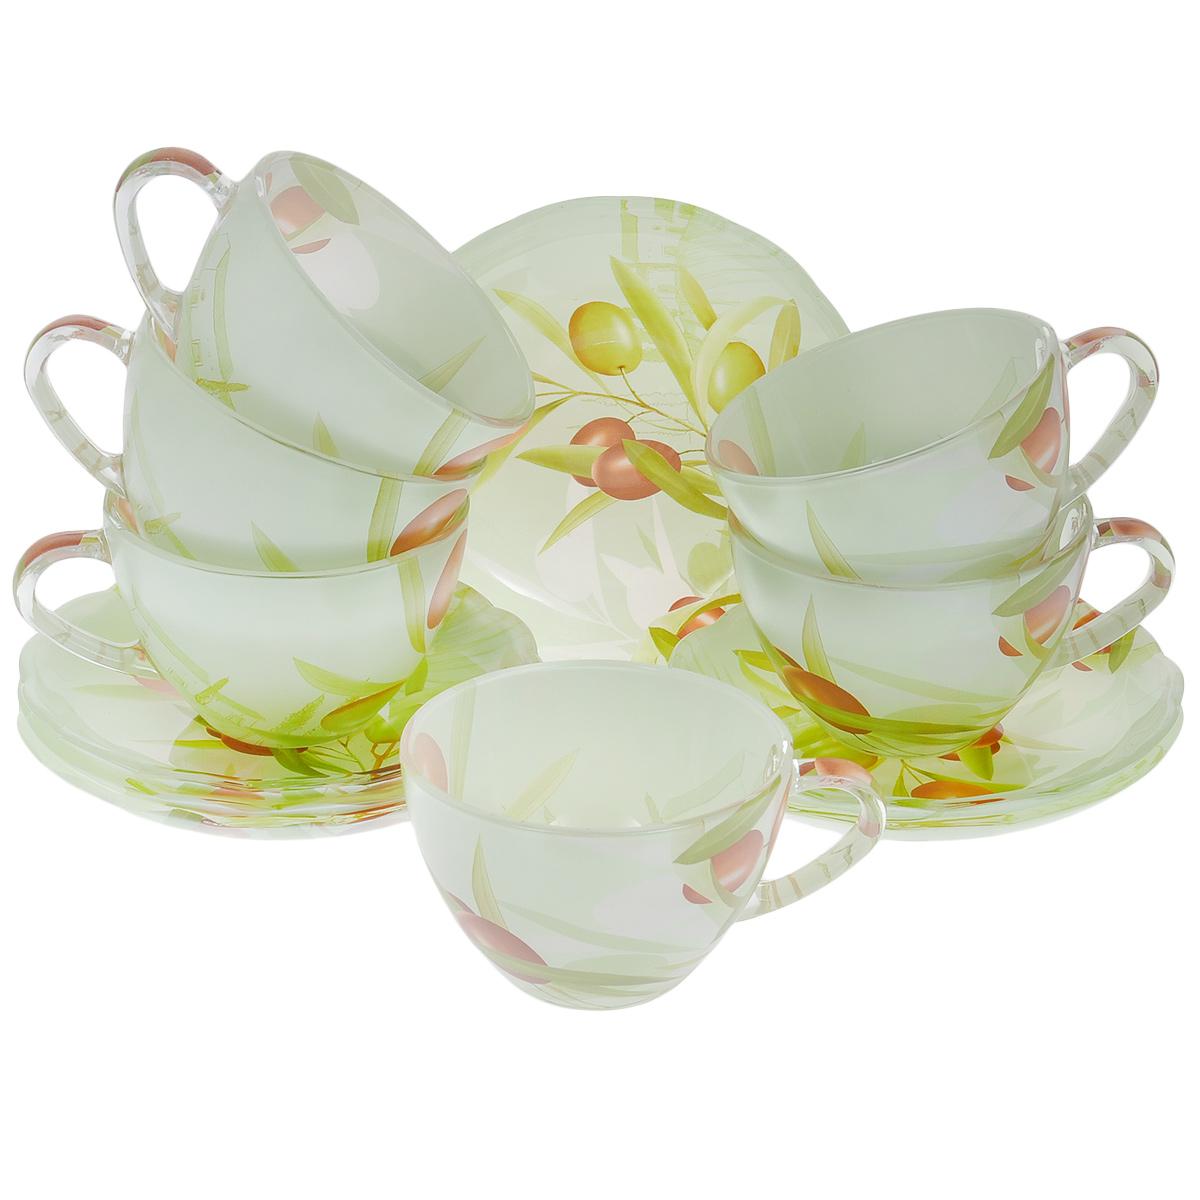 "Набор посуды ""Оливки"", 12 предметов, Porcelain Industry"